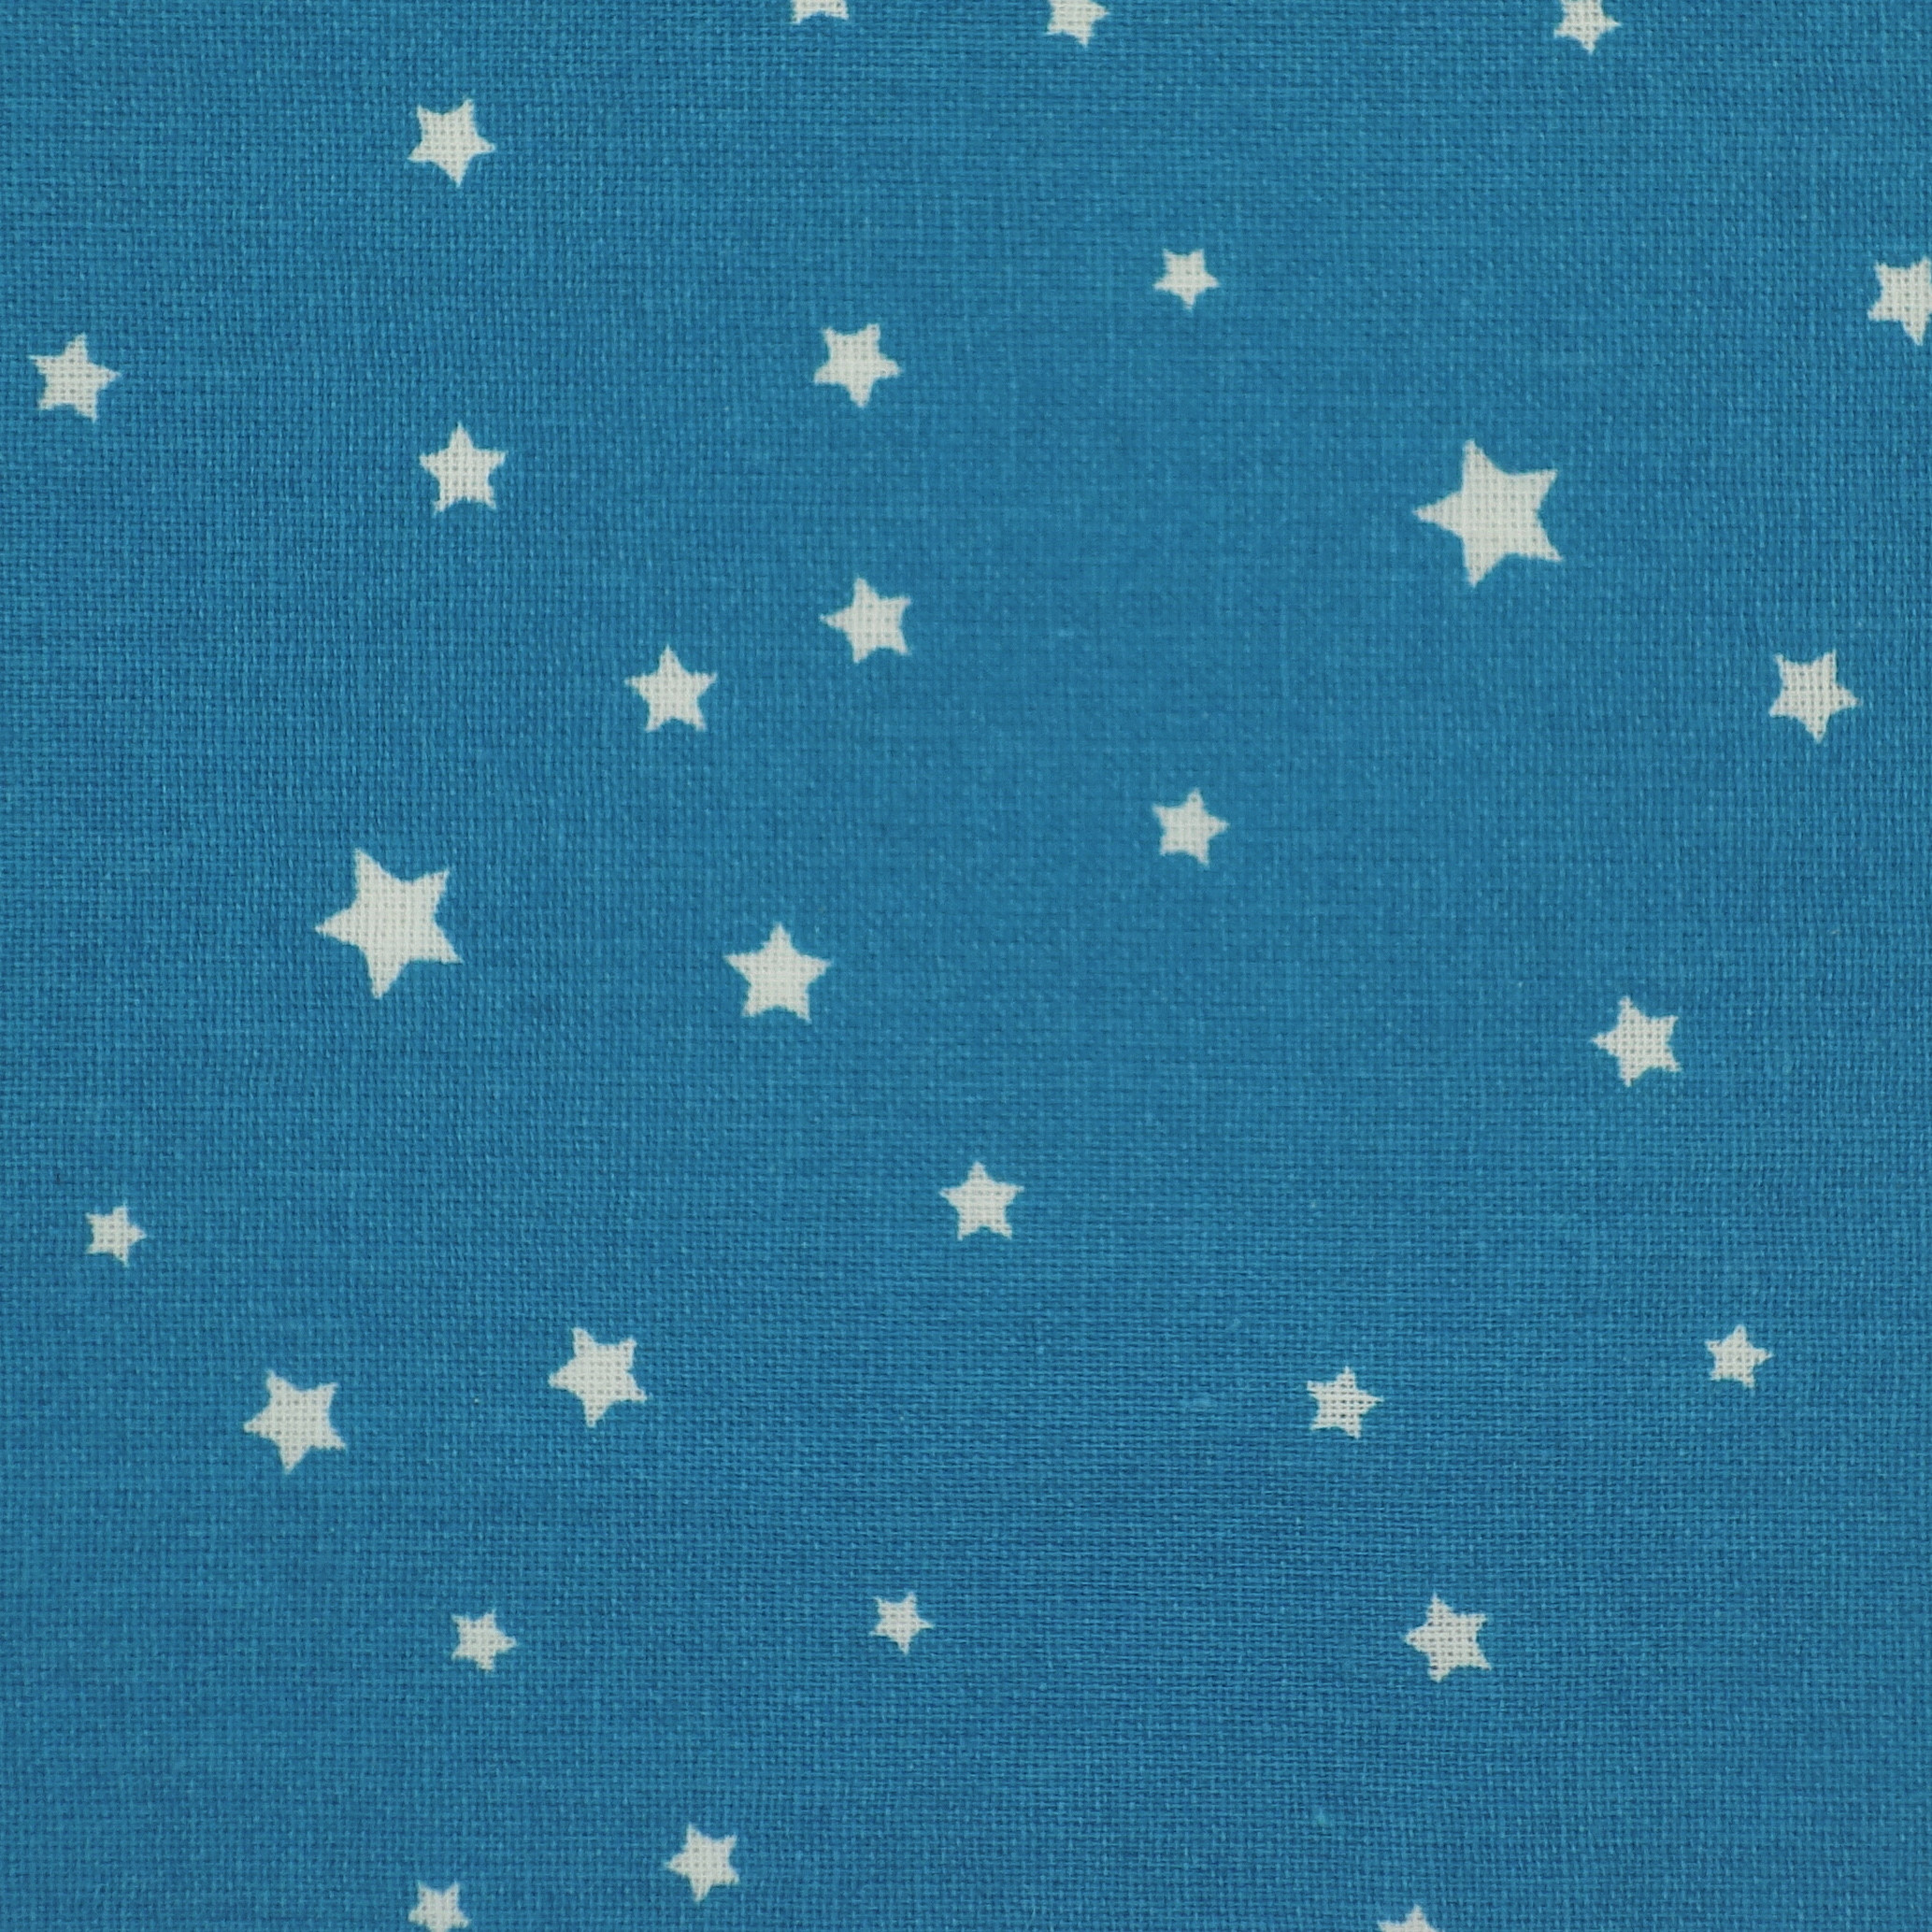 Étoiles bleues